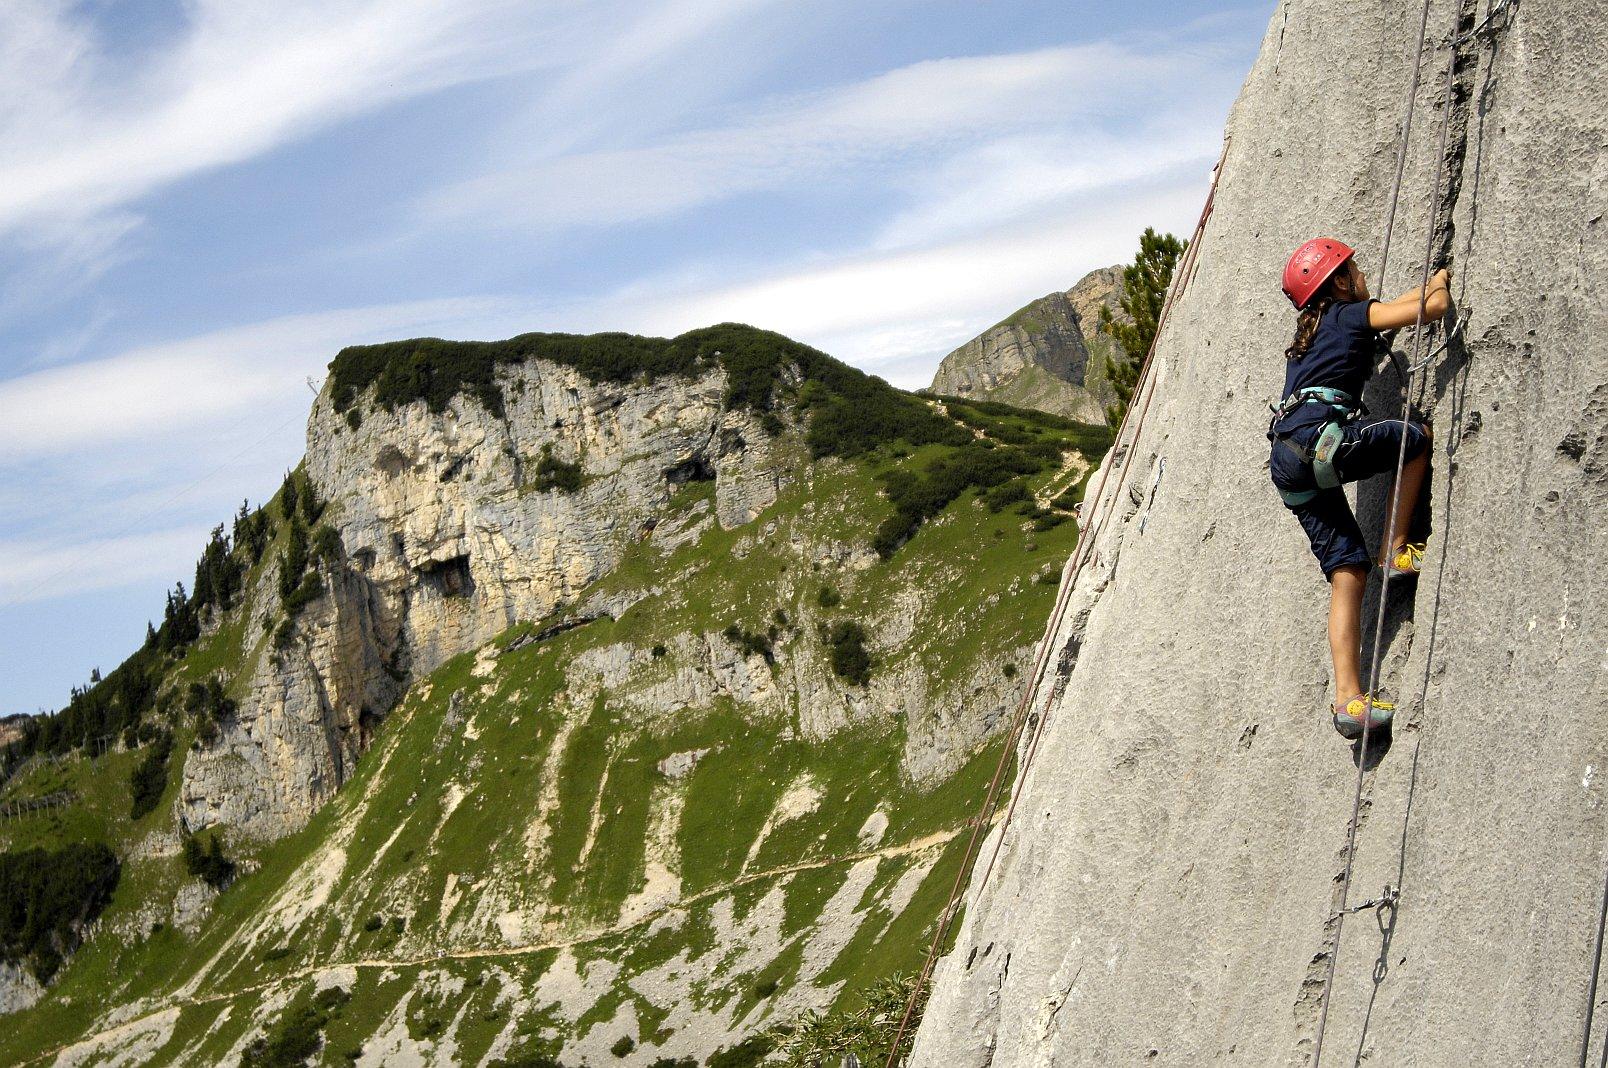 Familienklettern im Klettergarten Grubastiege, Foto: Sepp Rettenbacher | Climbers Paradise